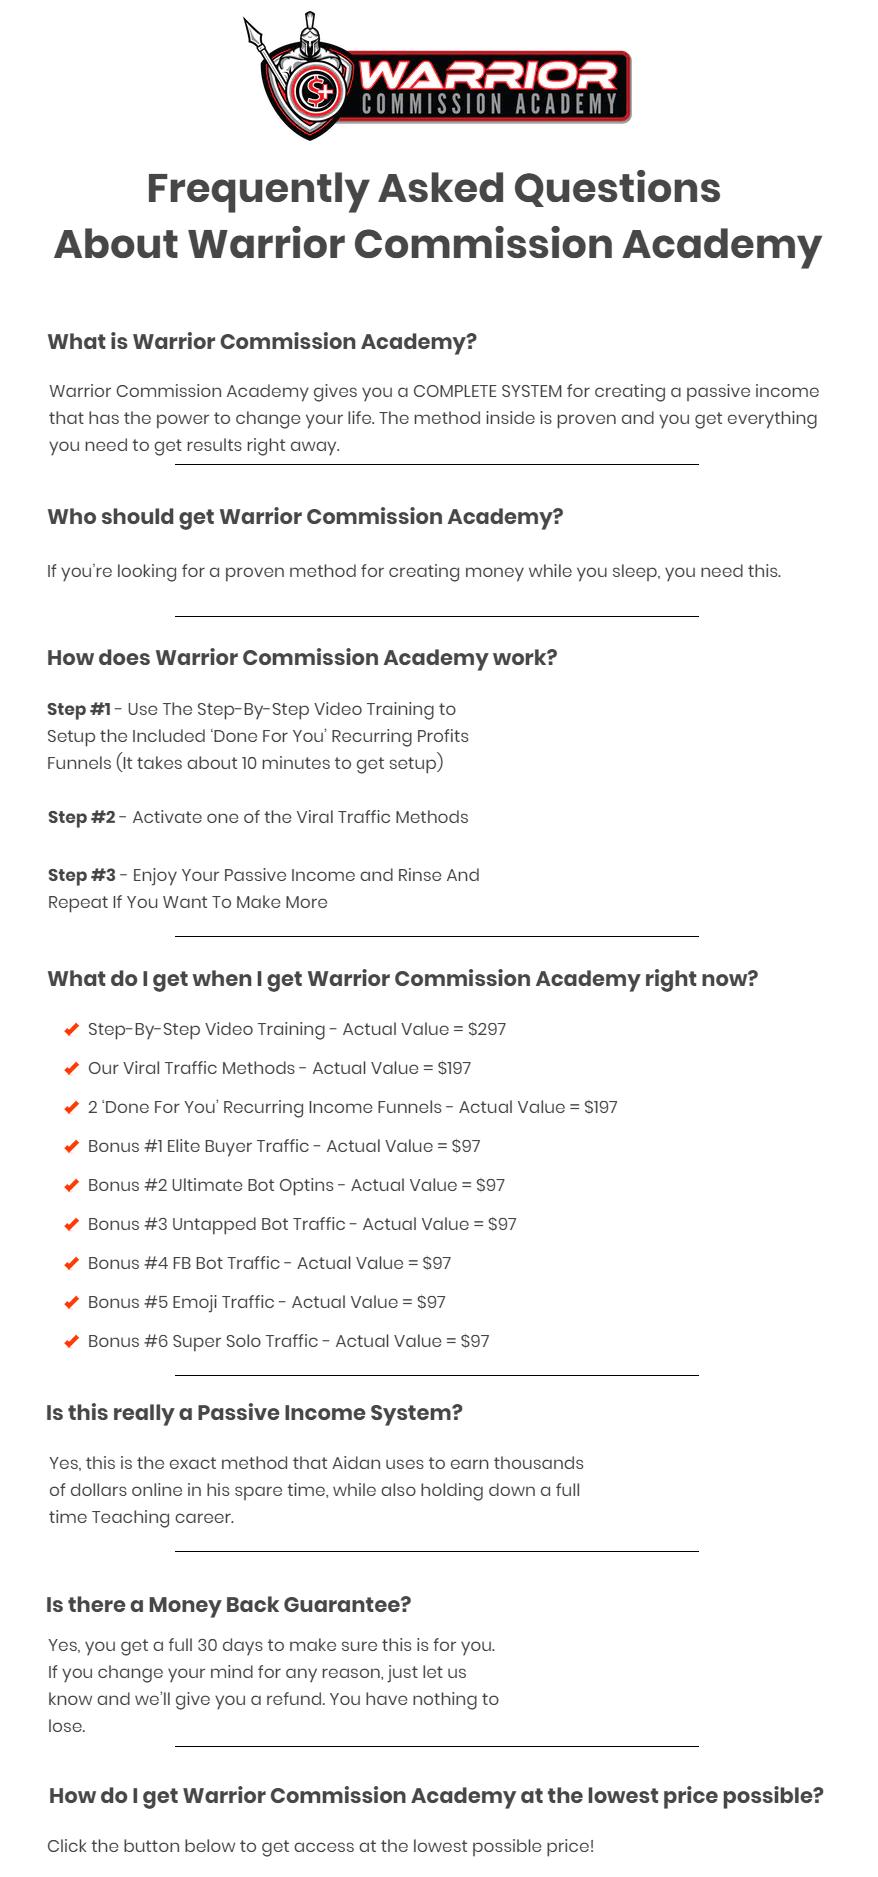 Warrior-Commission-Academy-QA